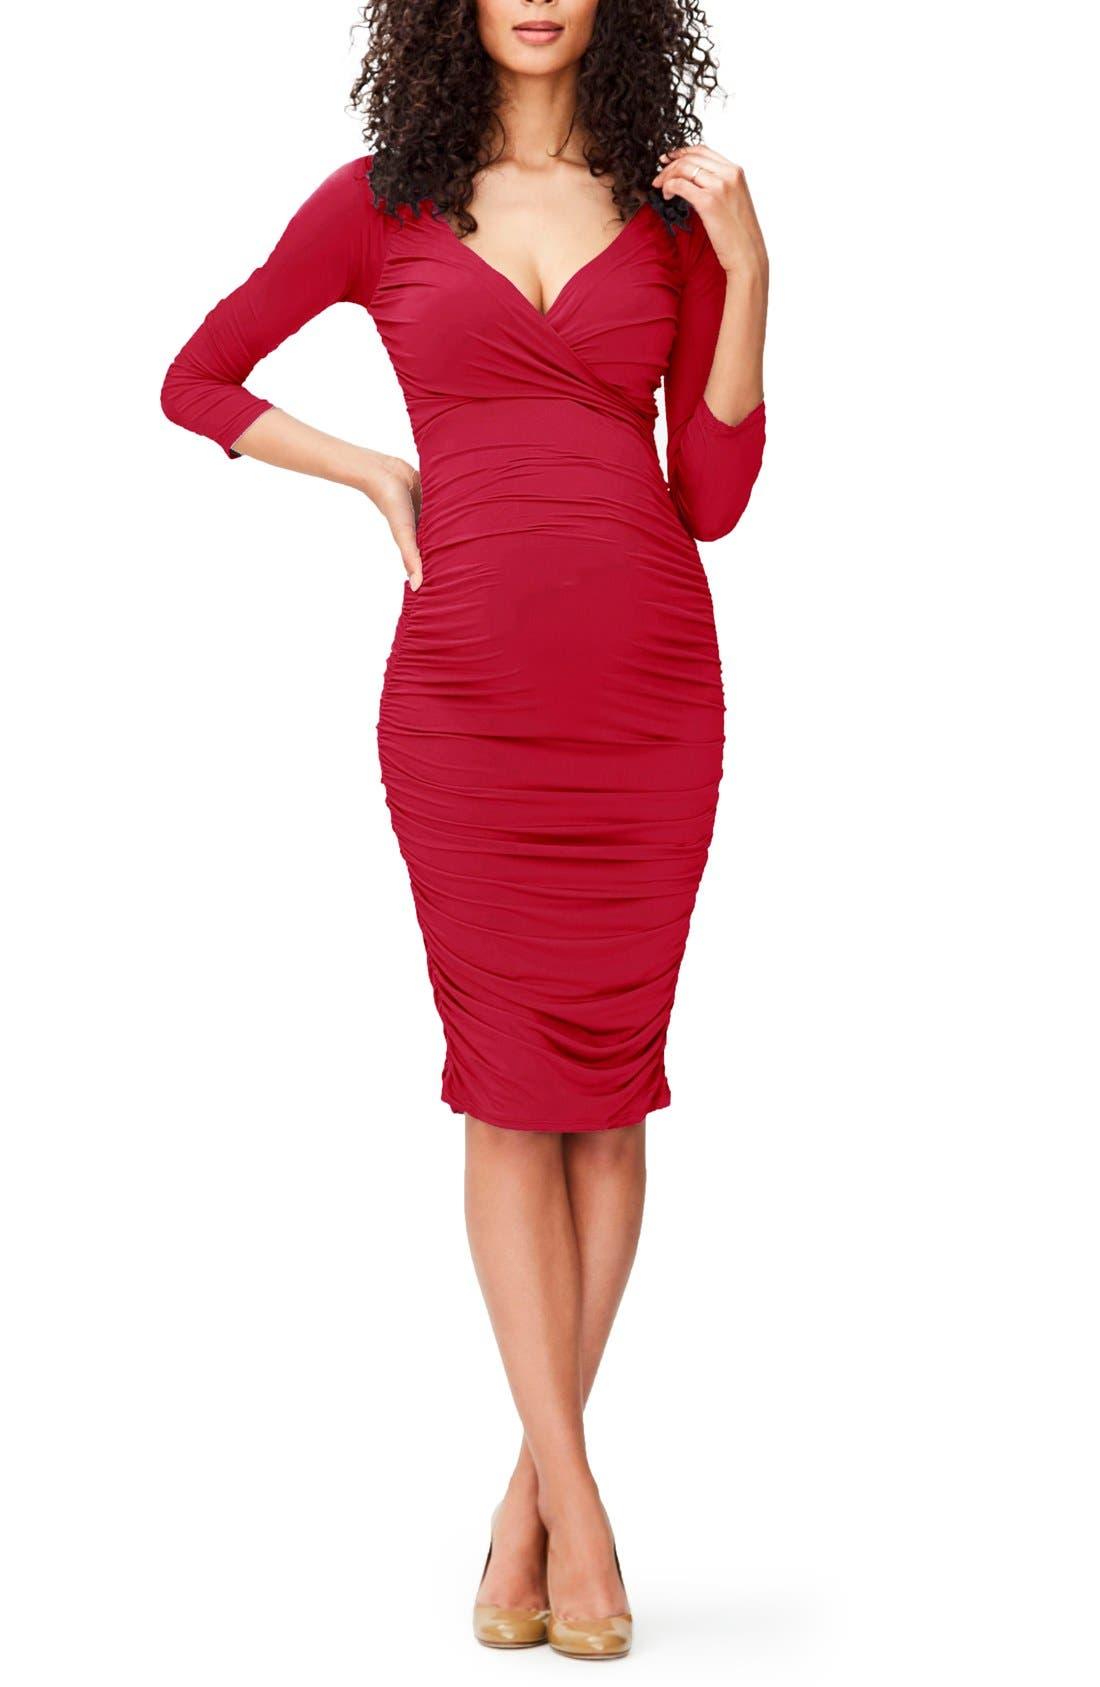 Leota 'Evelyn' Body-Con Maternity Dress